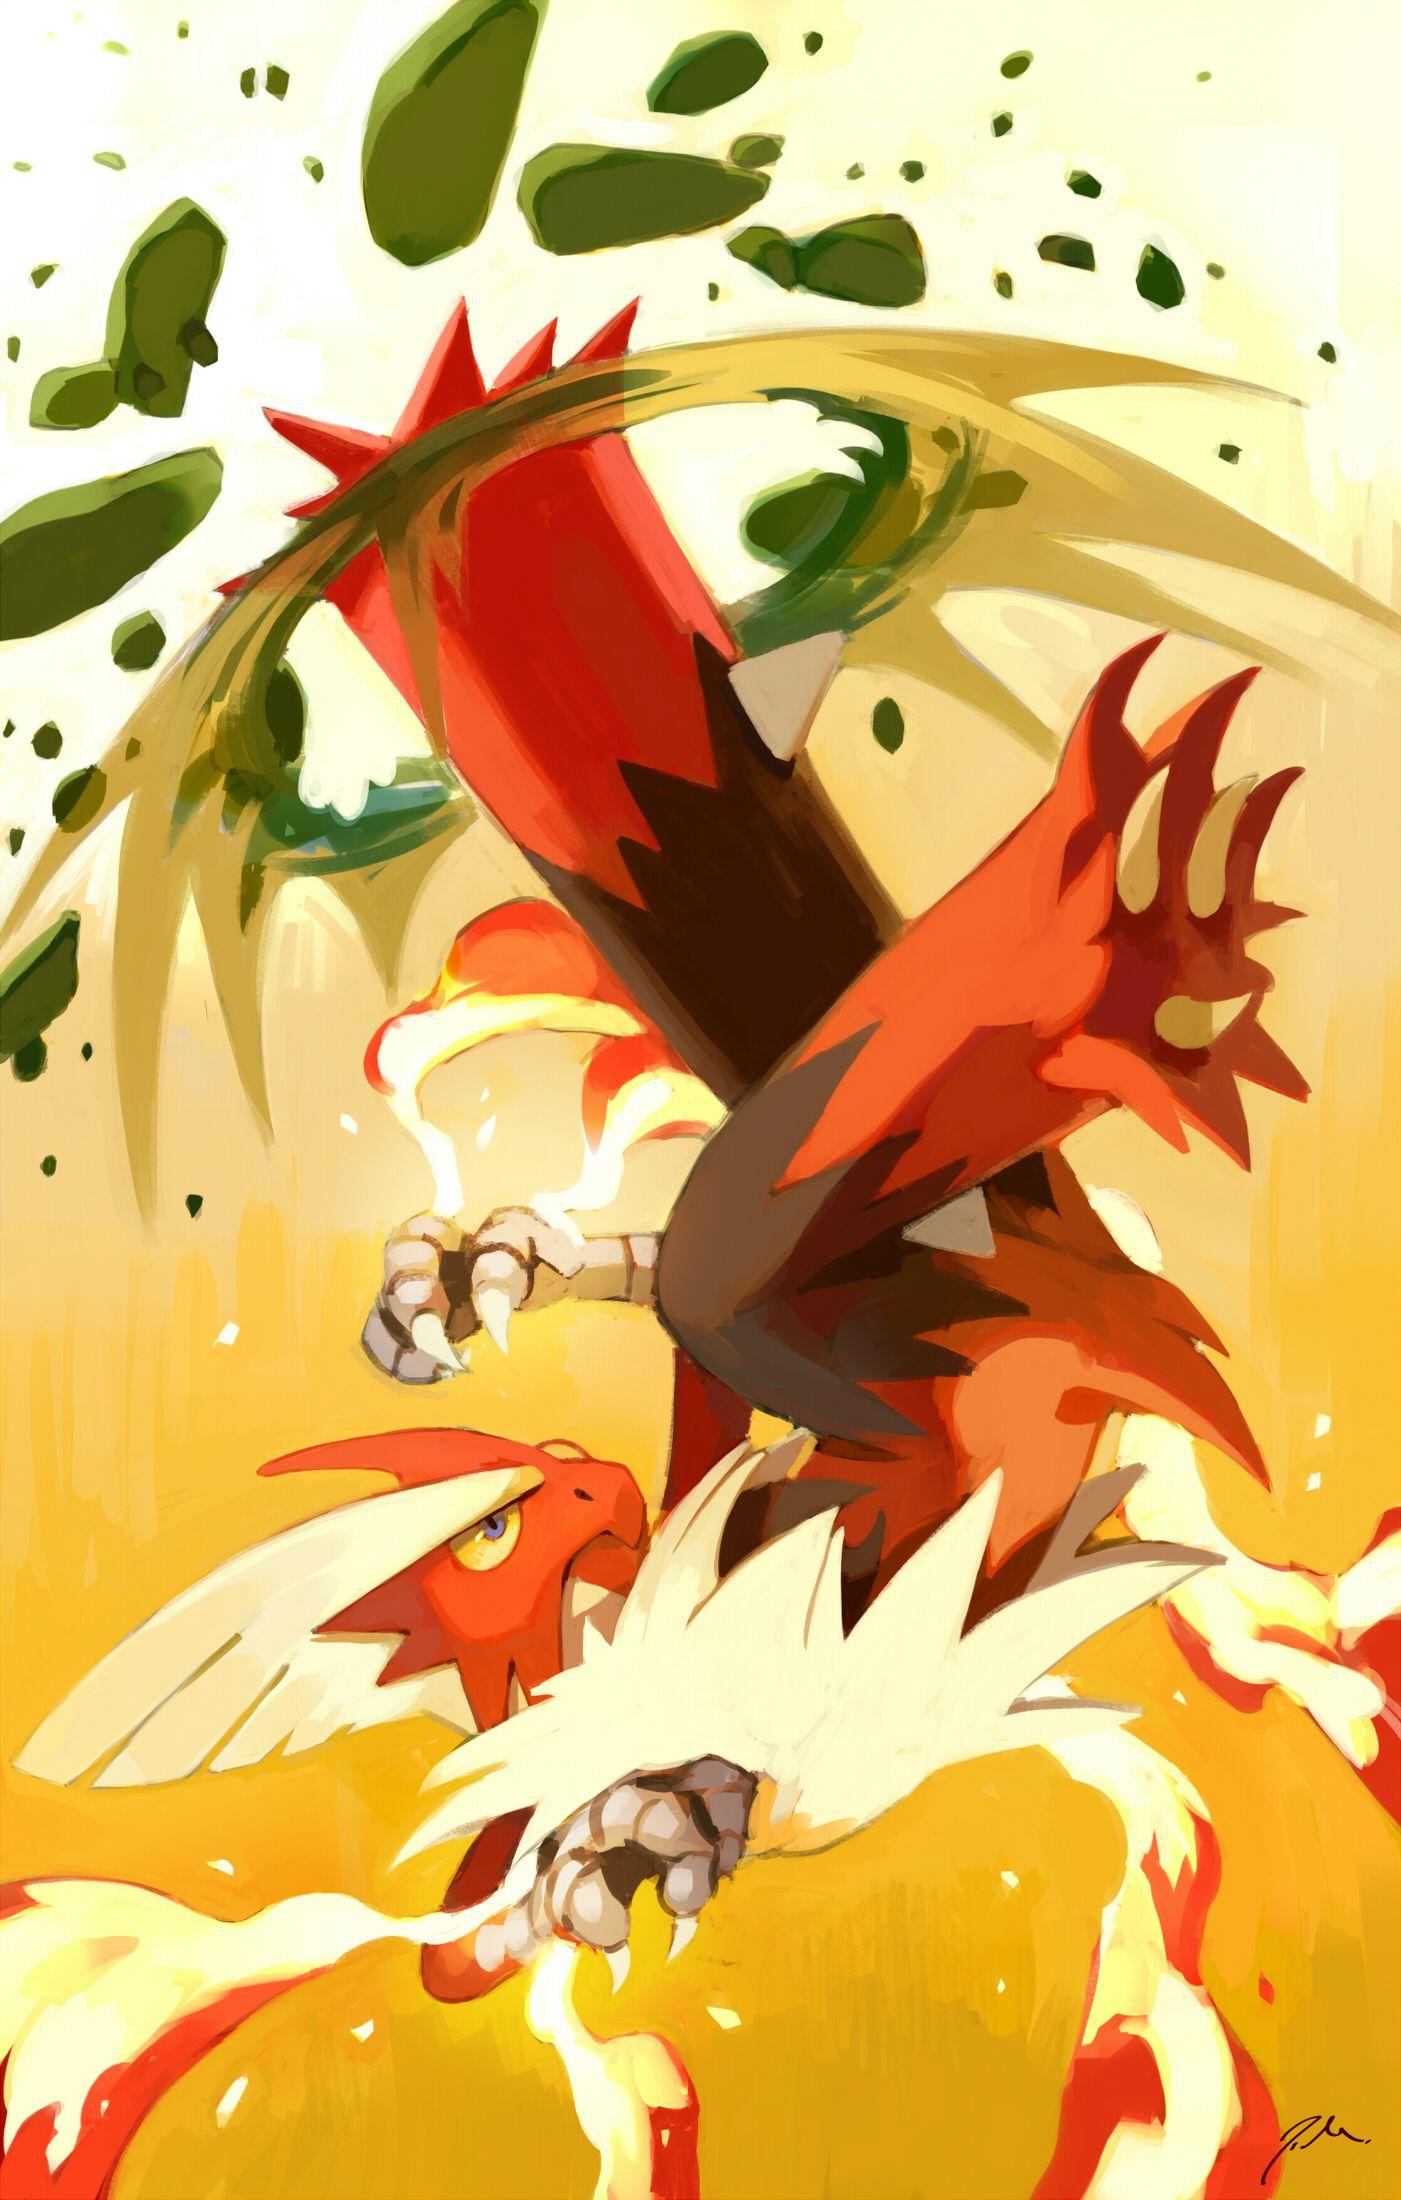 Mega blaziken by on deviantart pokemon things pinterest - Pokemon mega evolution blaziken ...